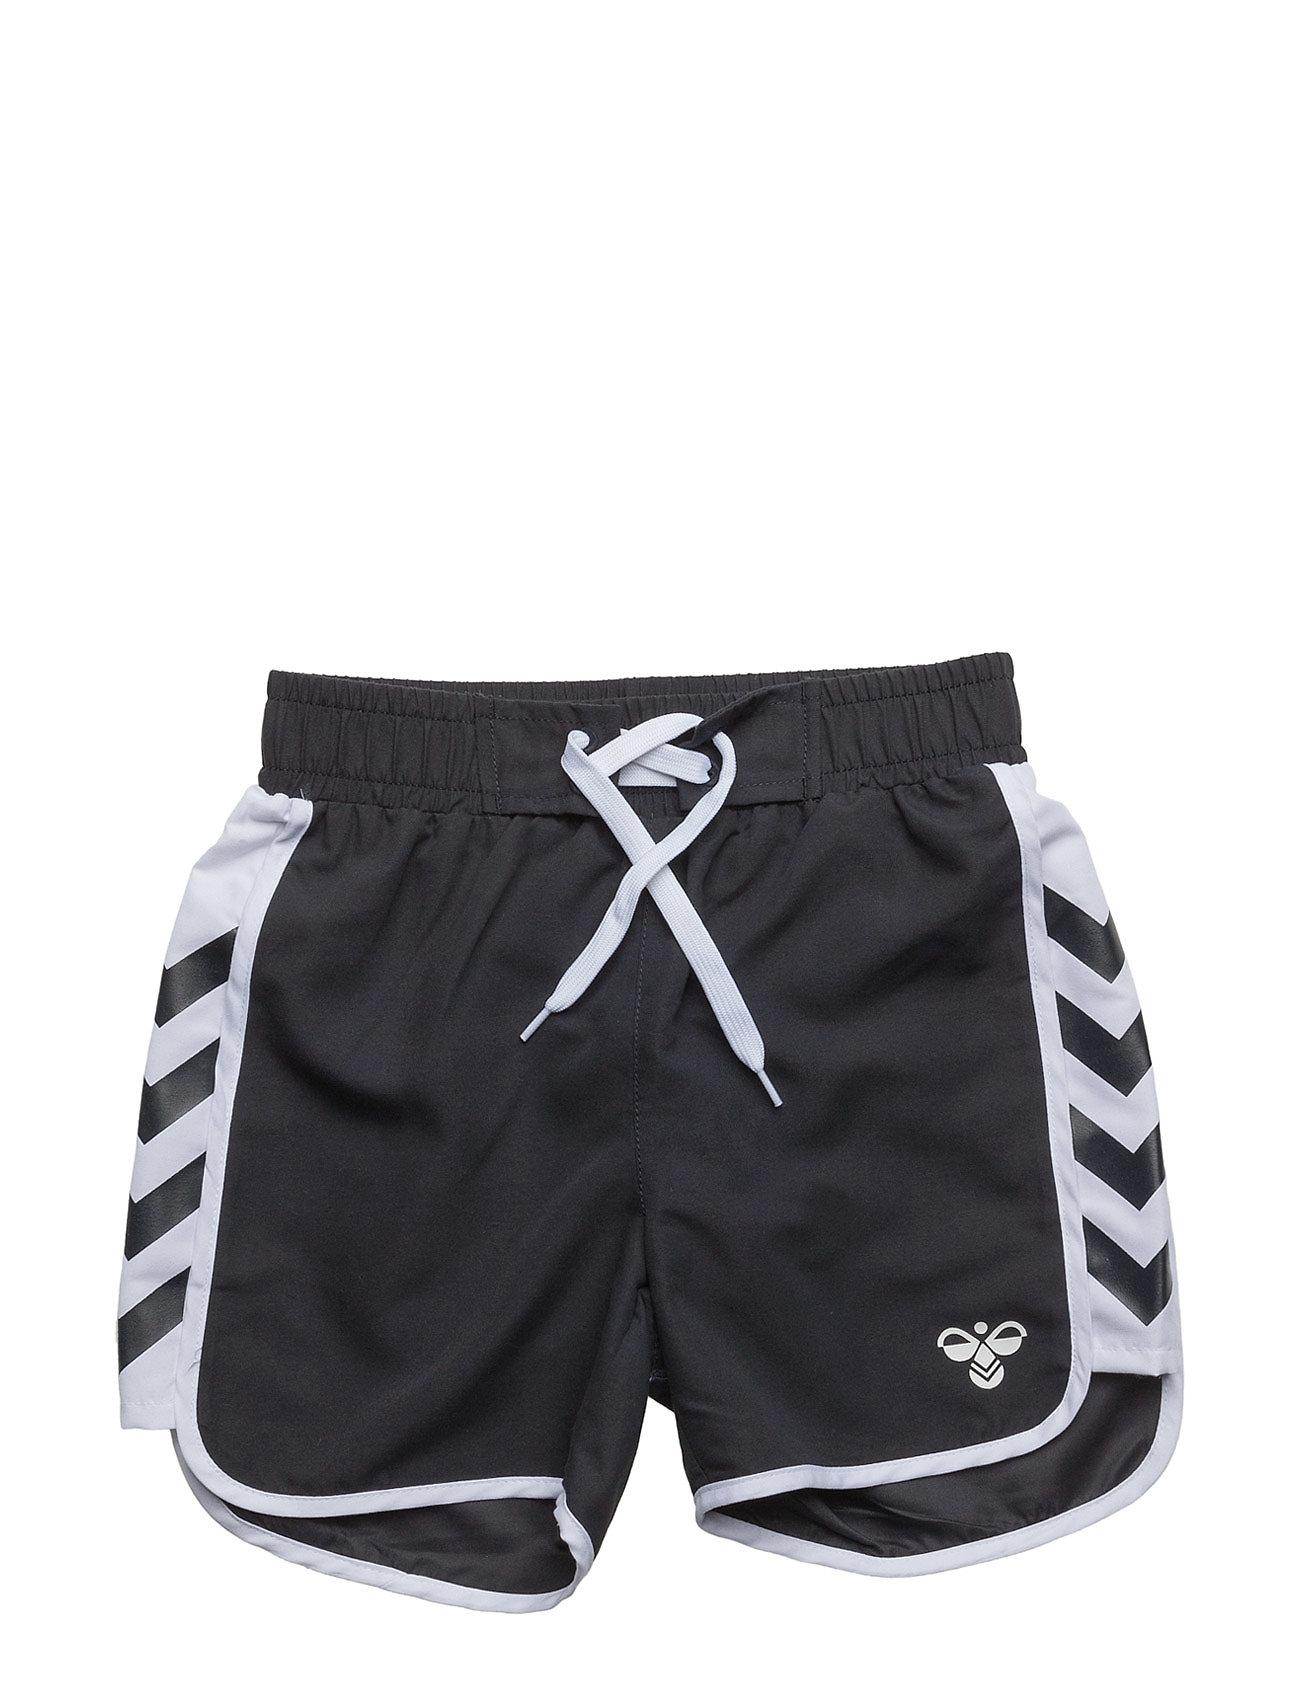 836975bd1edb Handla Kids > Swimwear från Hummel online: Max Swimshorts, Marya ...